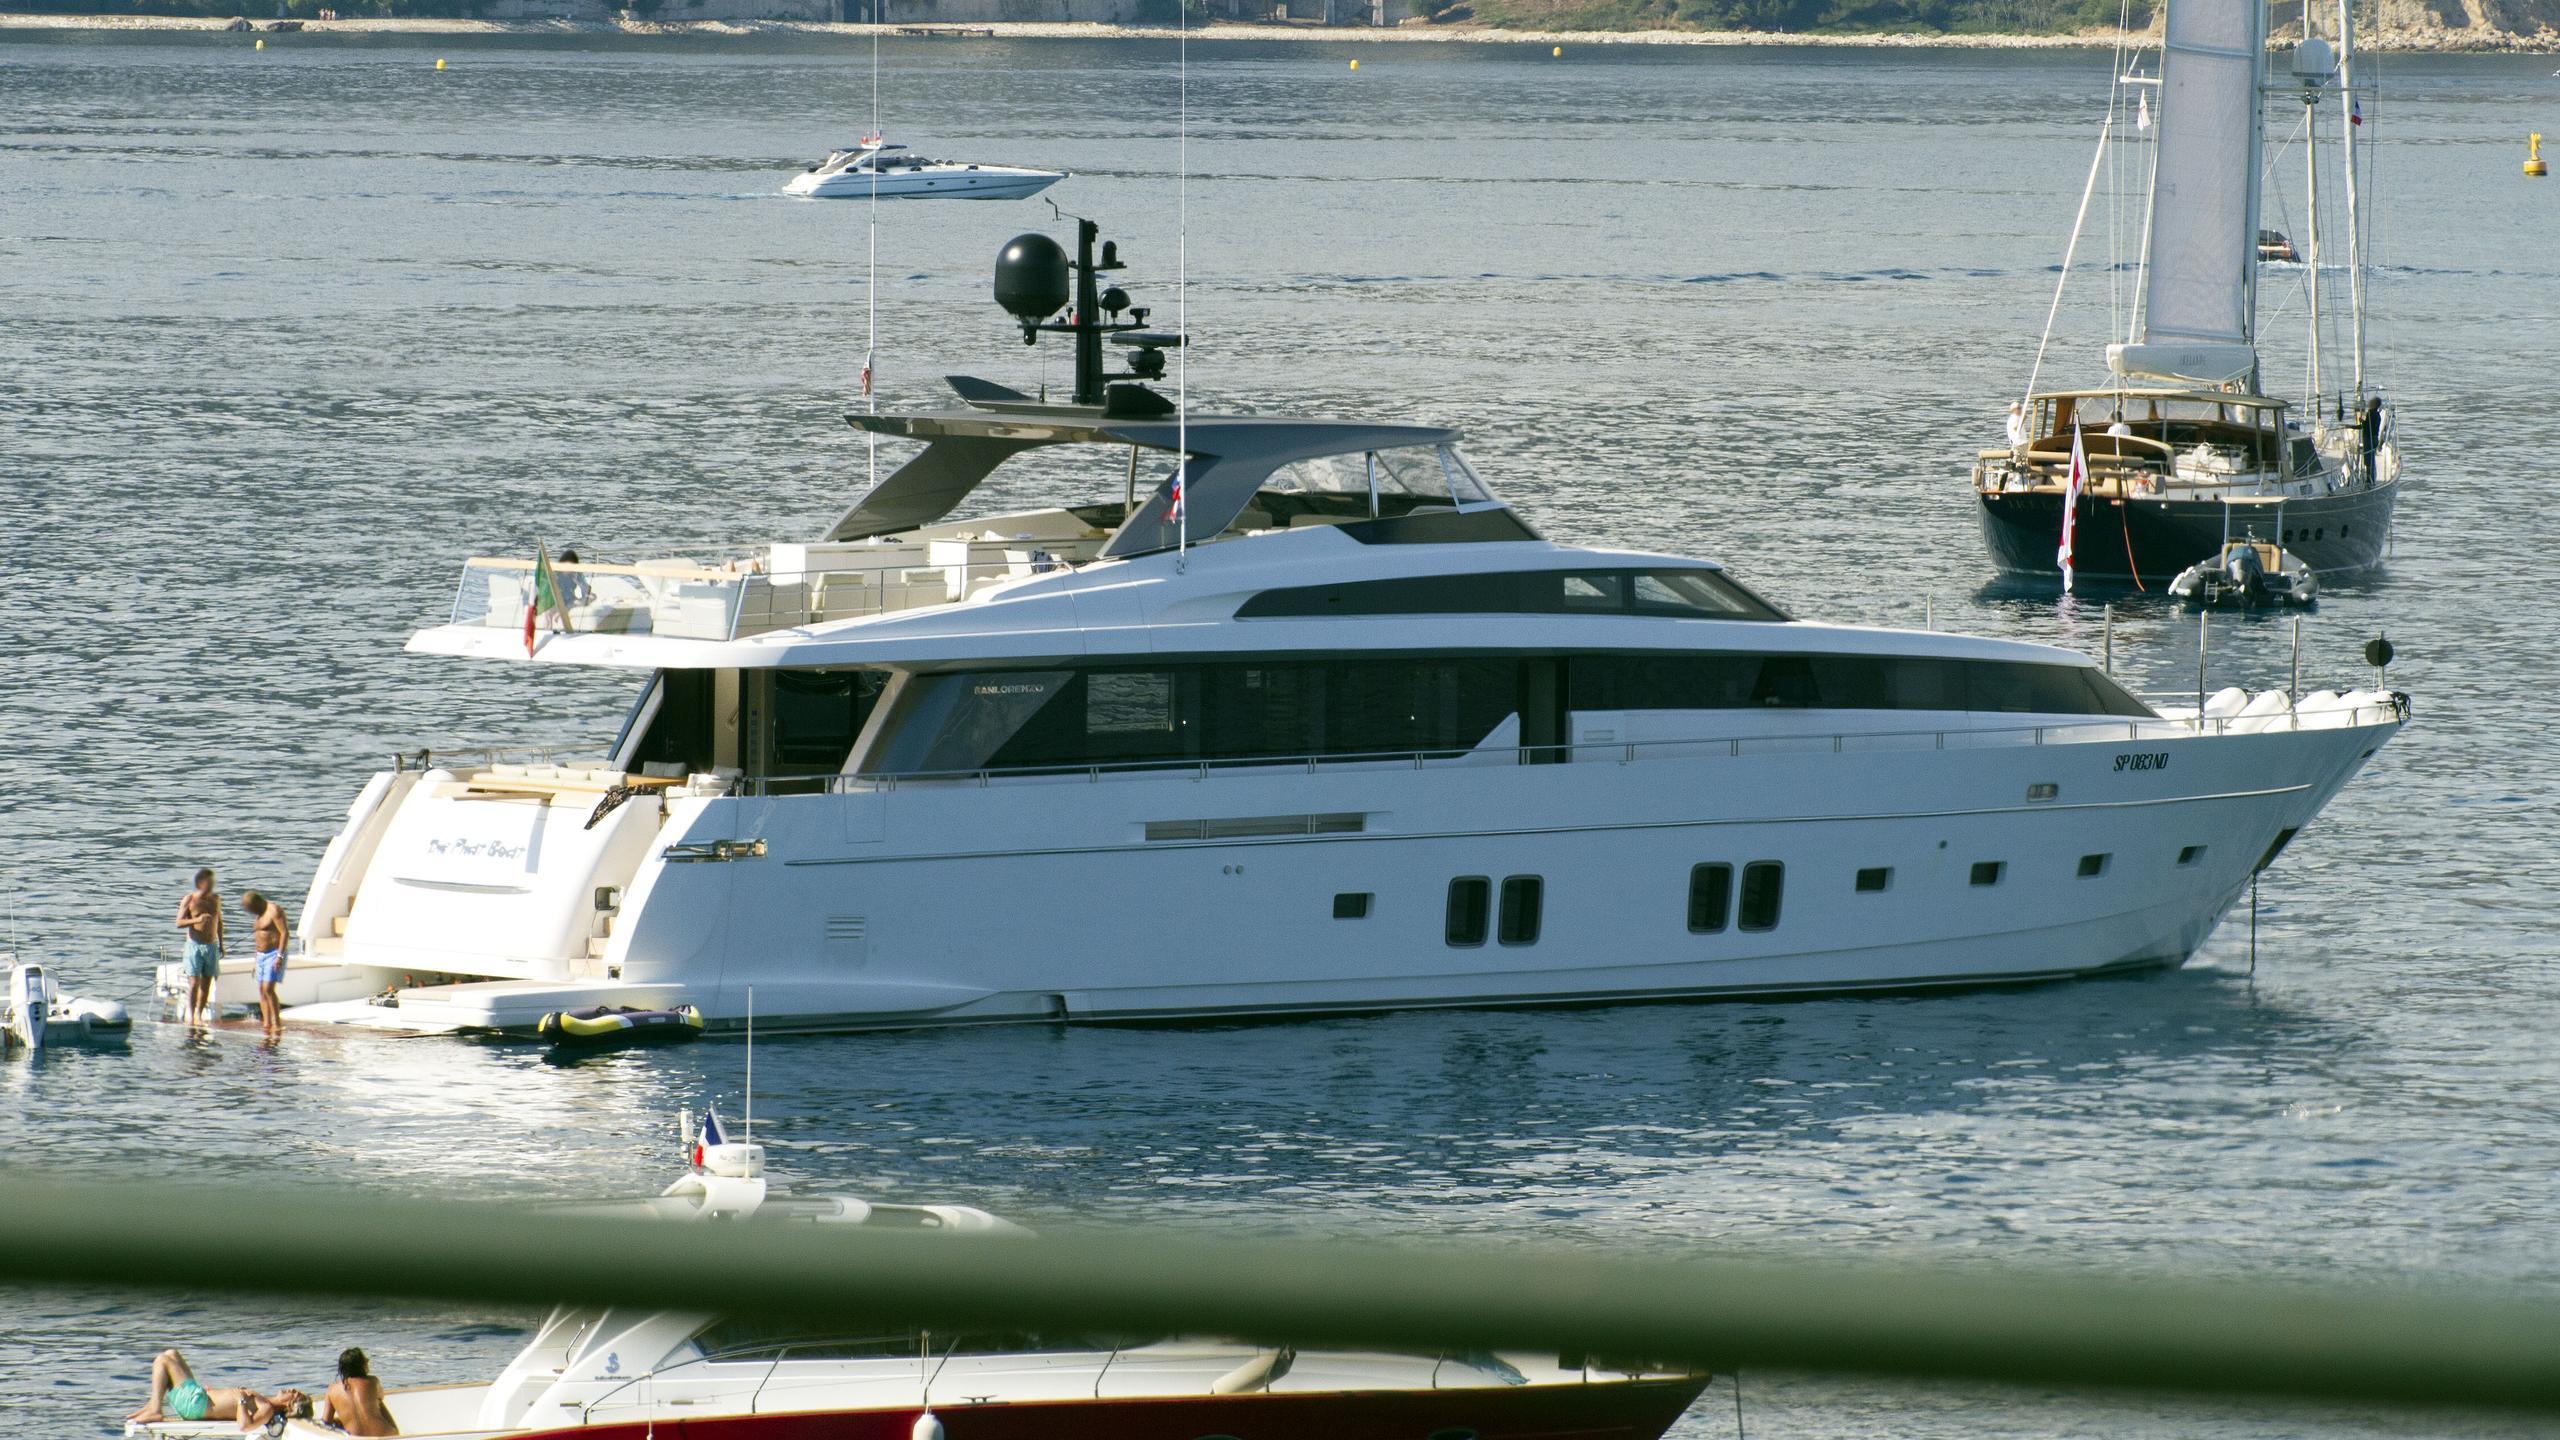 the-phat-boat-motor-yacht-sanlorenzo-sl-106-2015-32m-half-profile